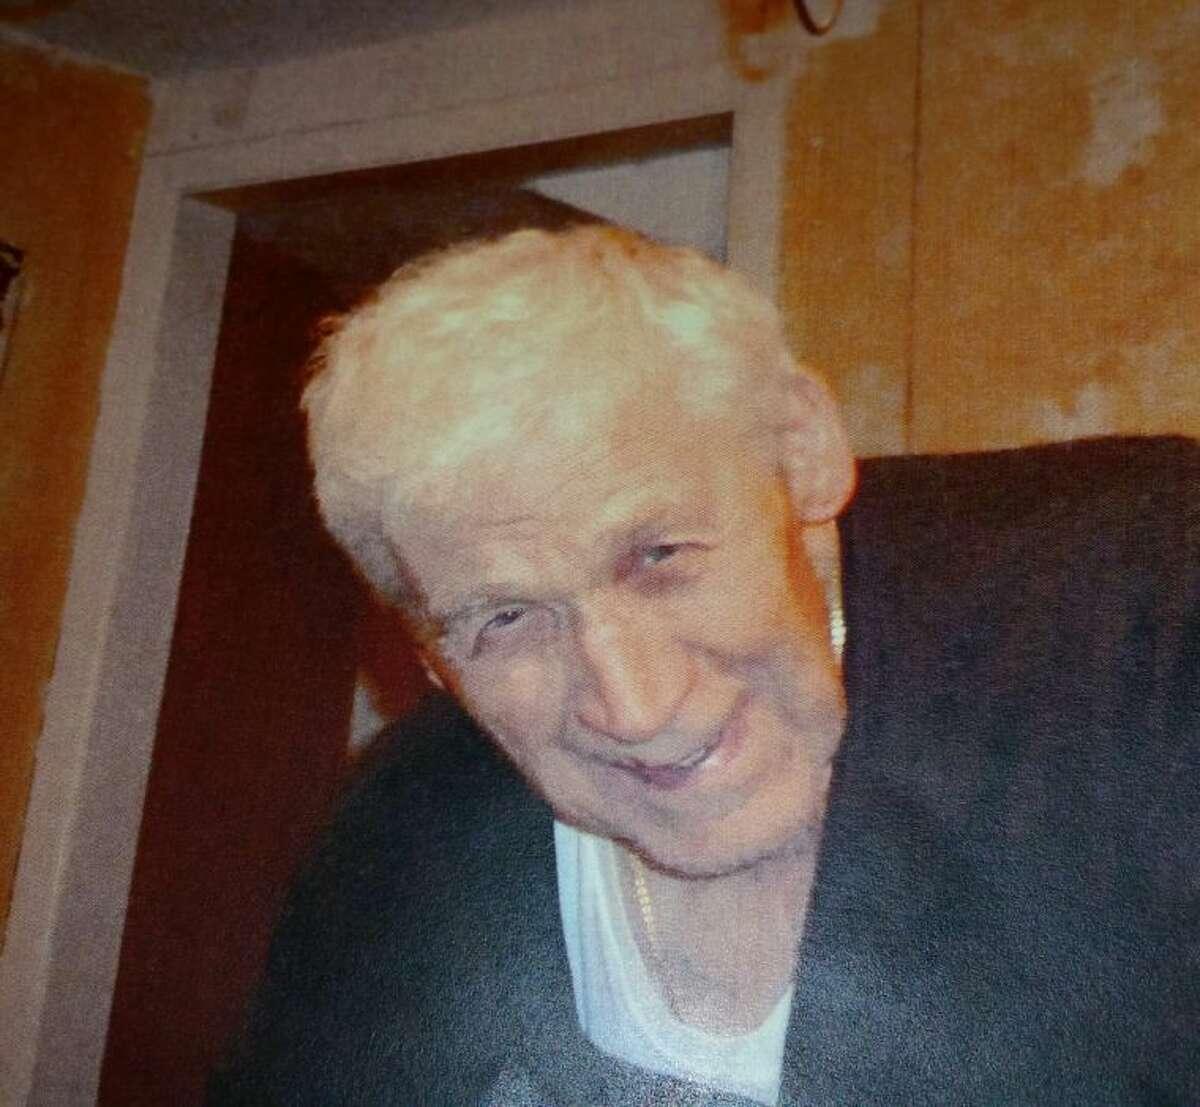 93-year-old Wojciech Piekos missing